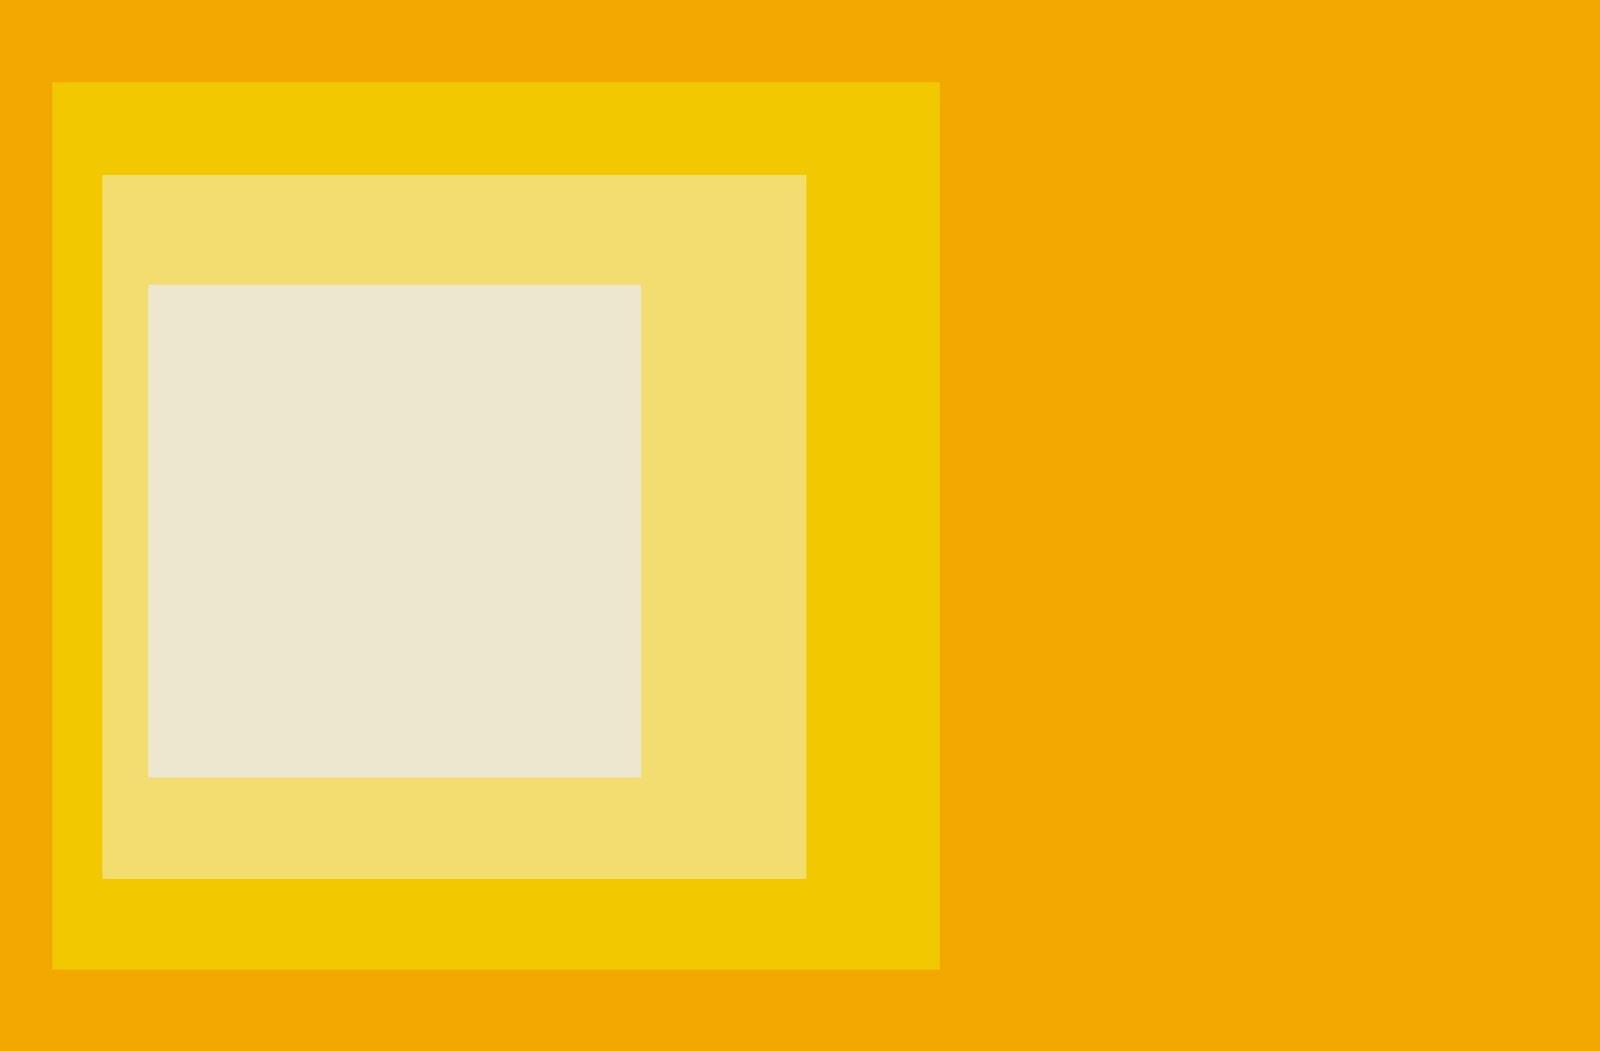 Josef Albers Screensaver | modern design by moderndesign.org